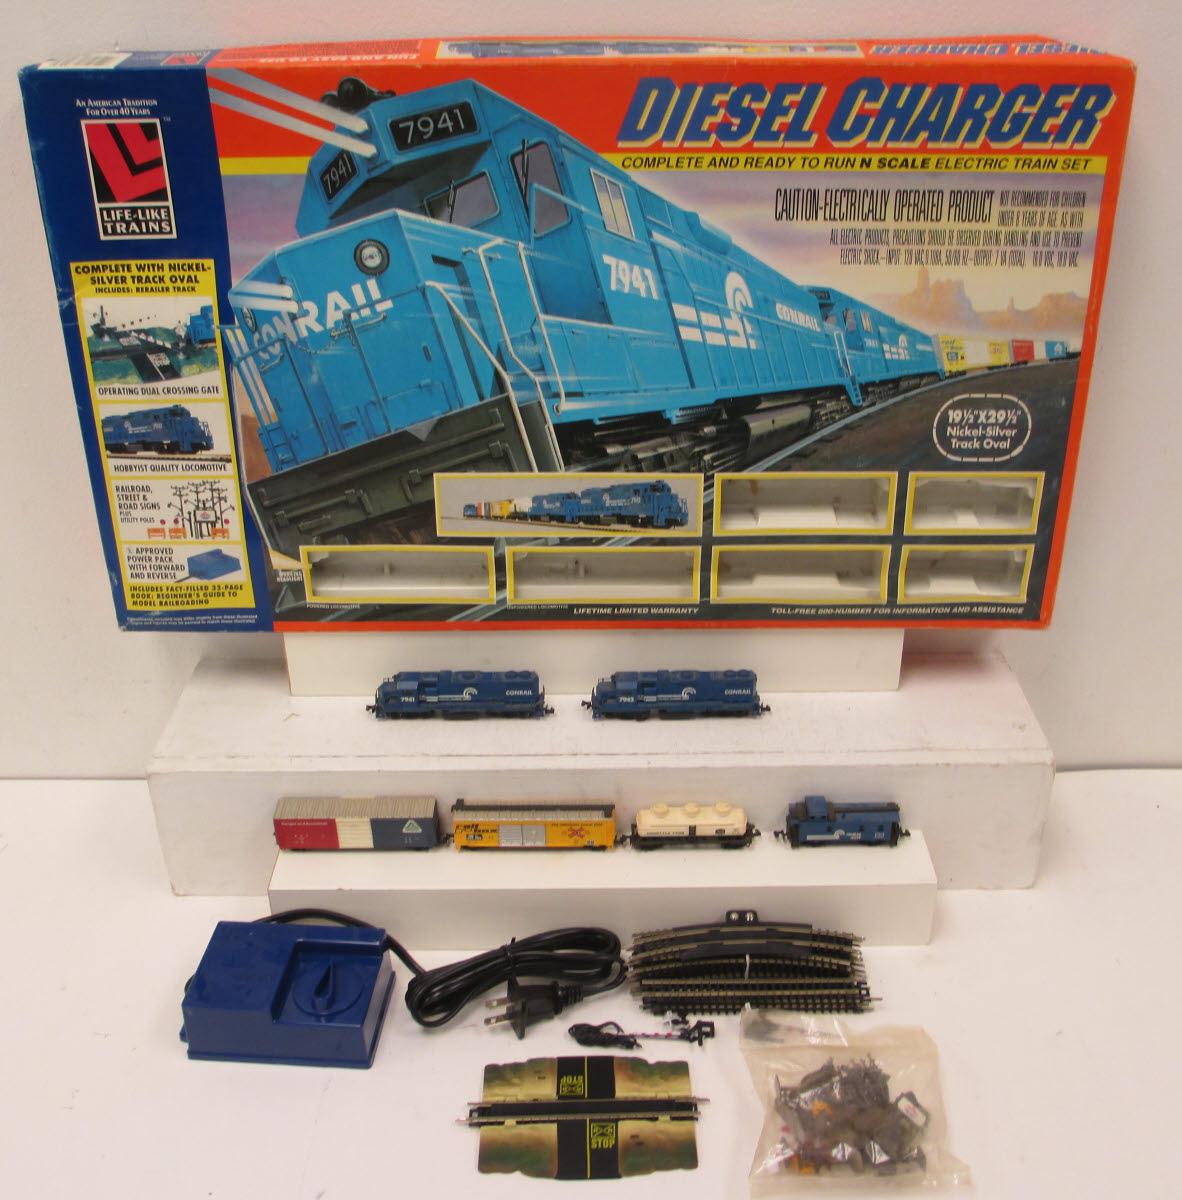 N Scale - Life-Like - Diesel Charger - Freight Train, Diesel, North American, 2nd Generation Diesel Era - Conrail